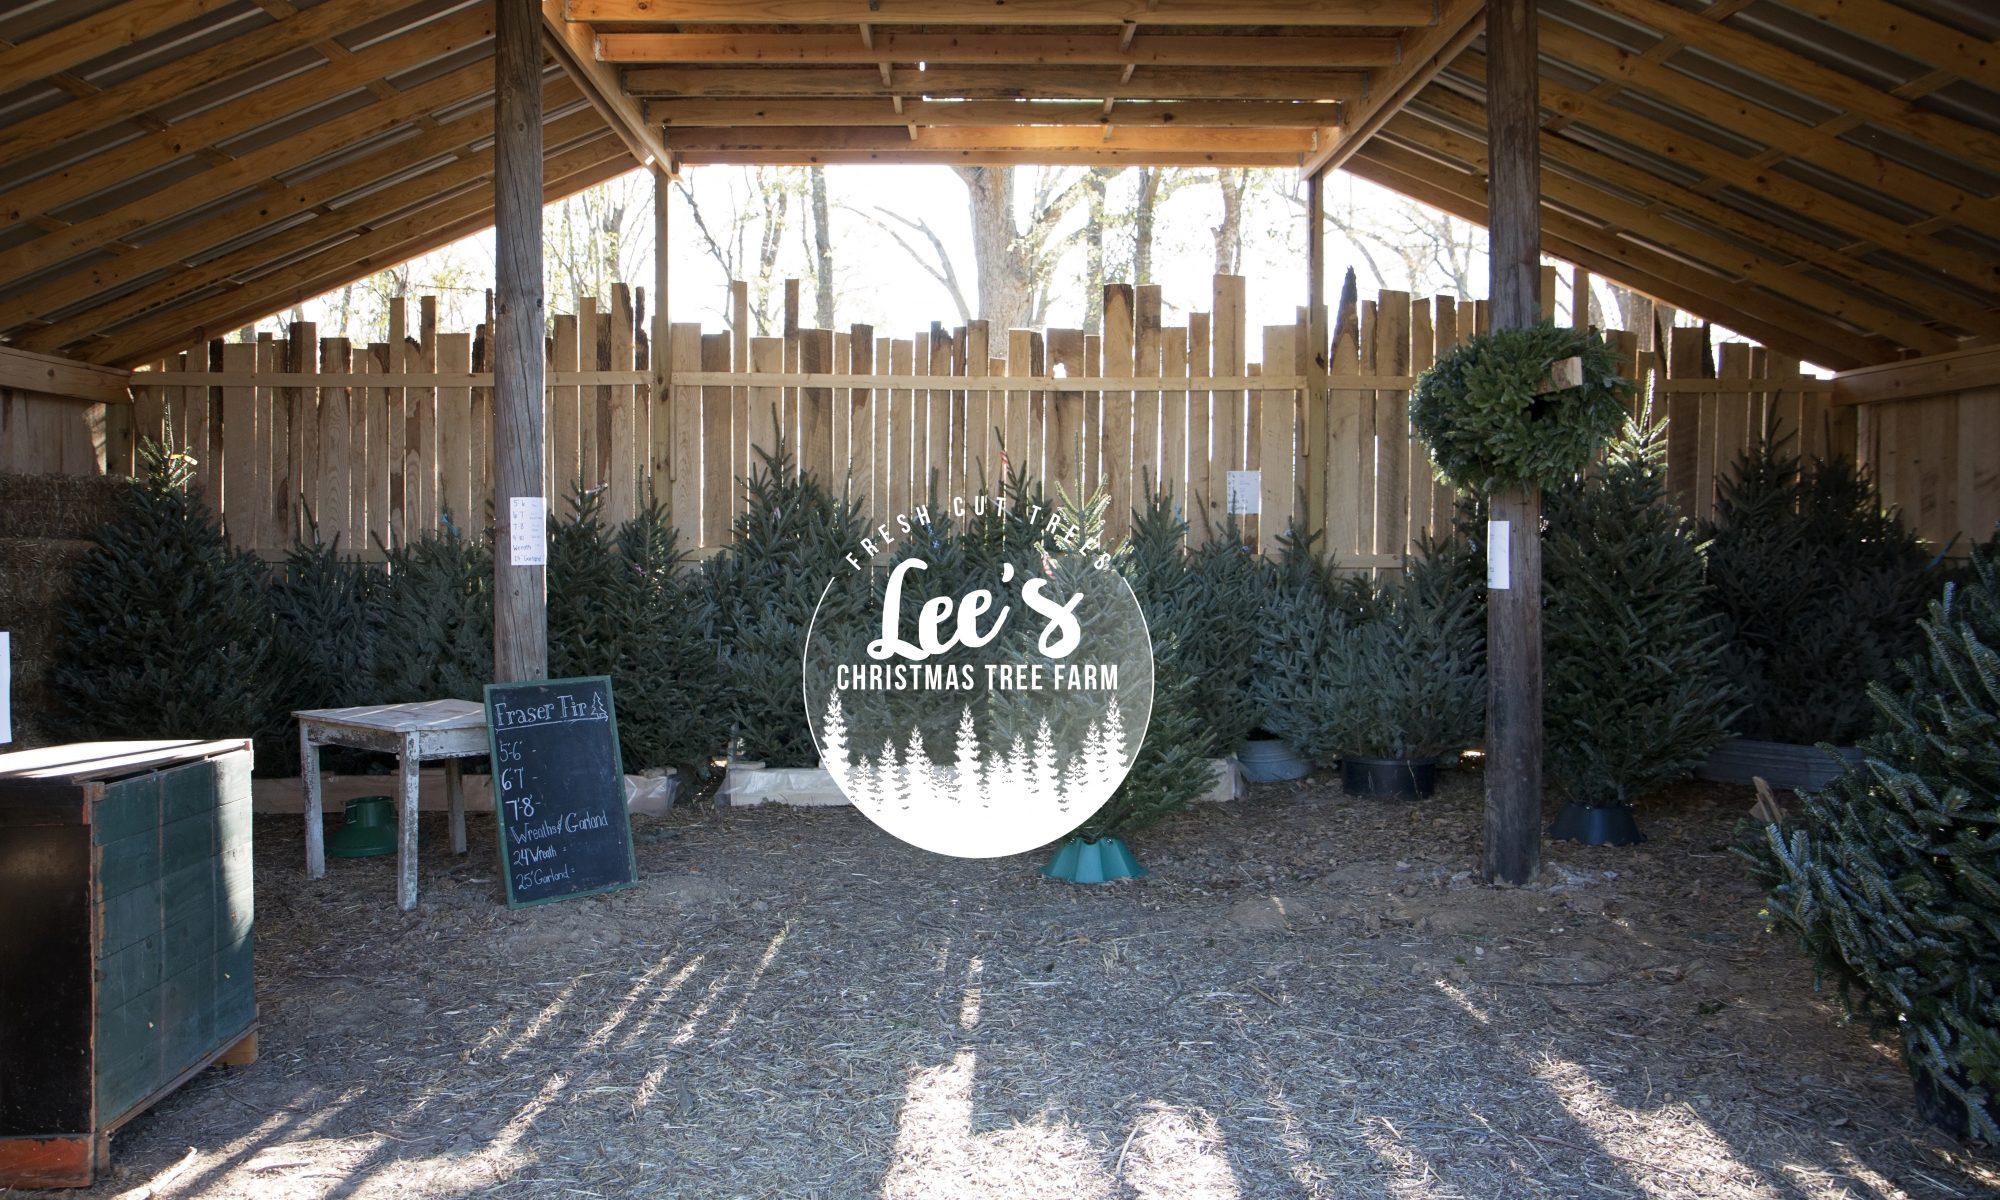 Lee's Christmas Tree Farm